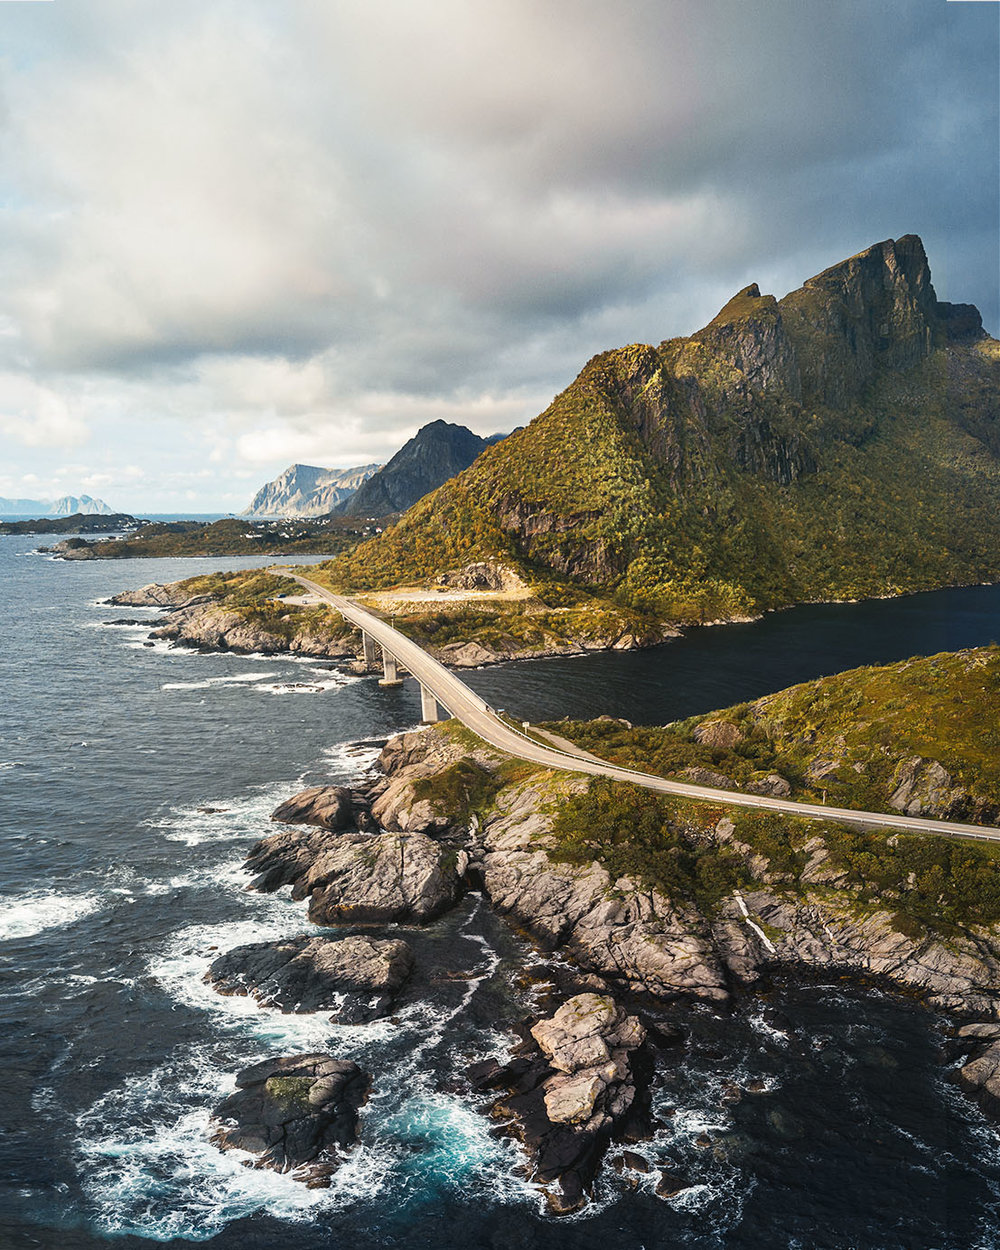 lofoten islands Norway drone photography